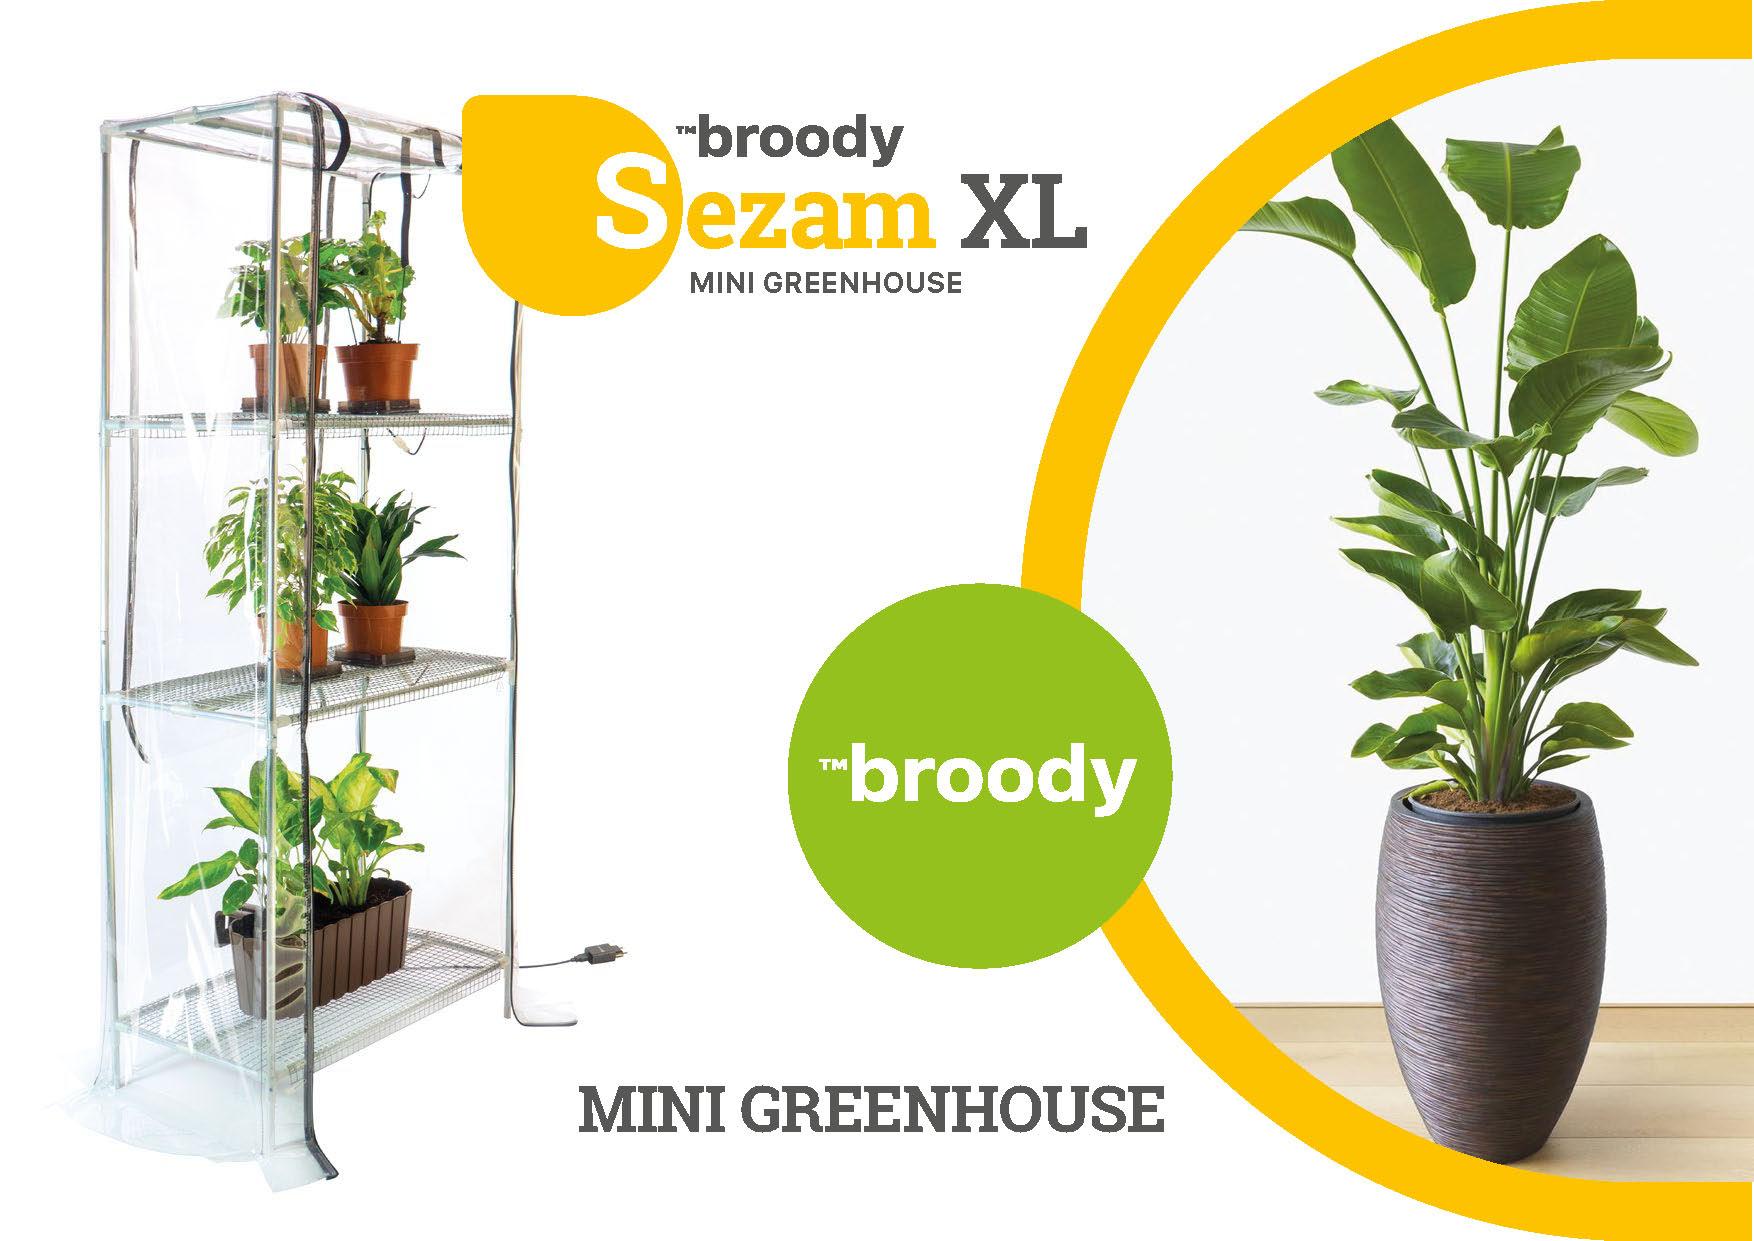 Sezam_XL_indoor_greenhouse_system_01